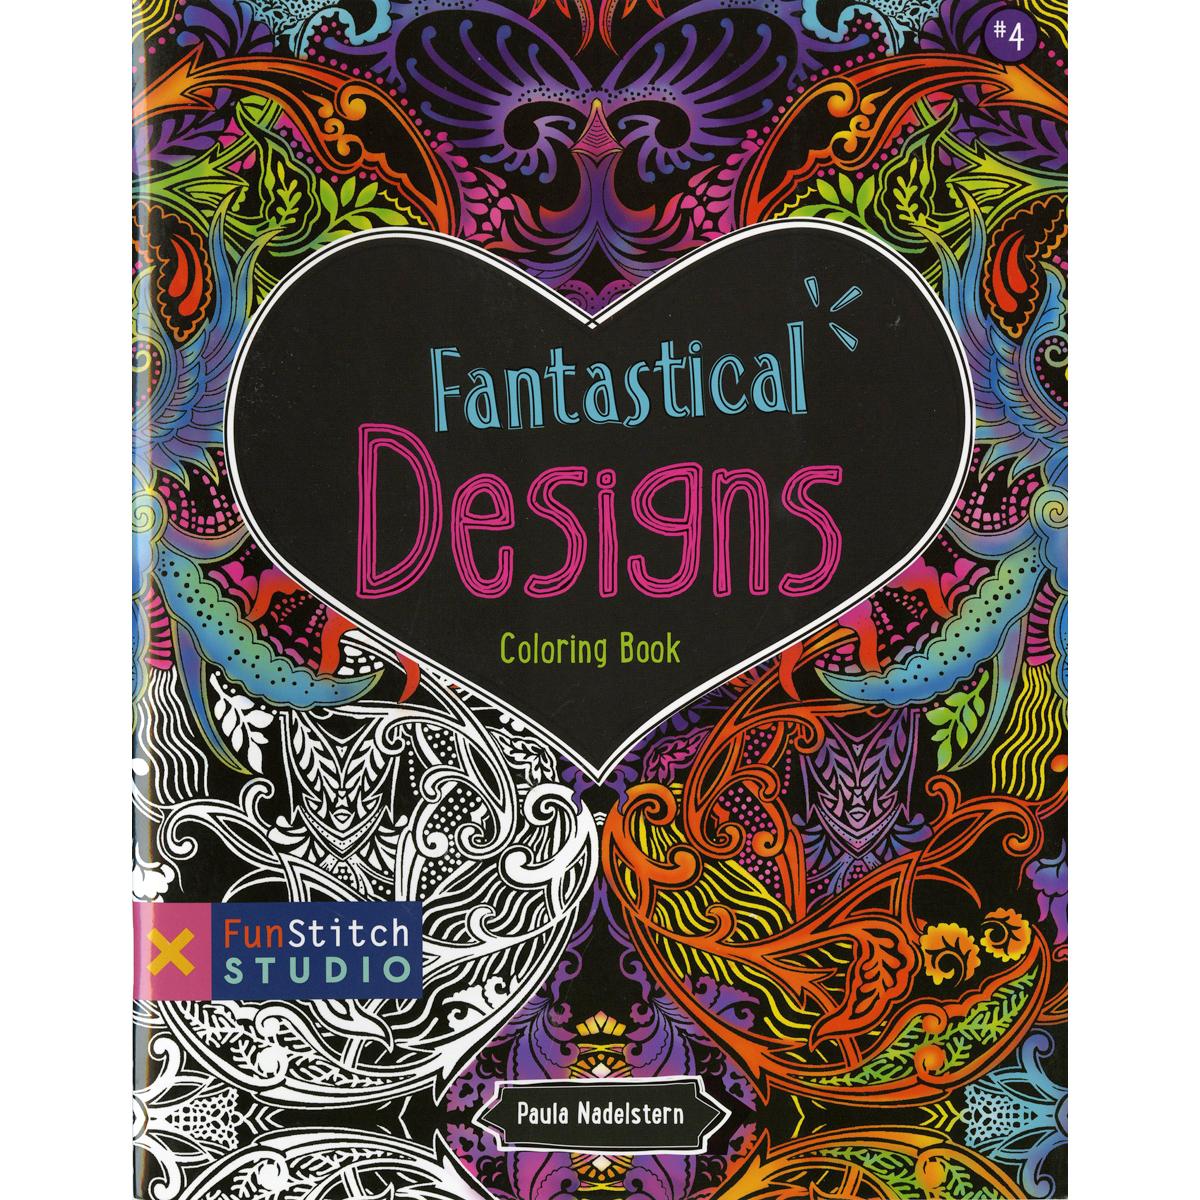 Fantastical Designs